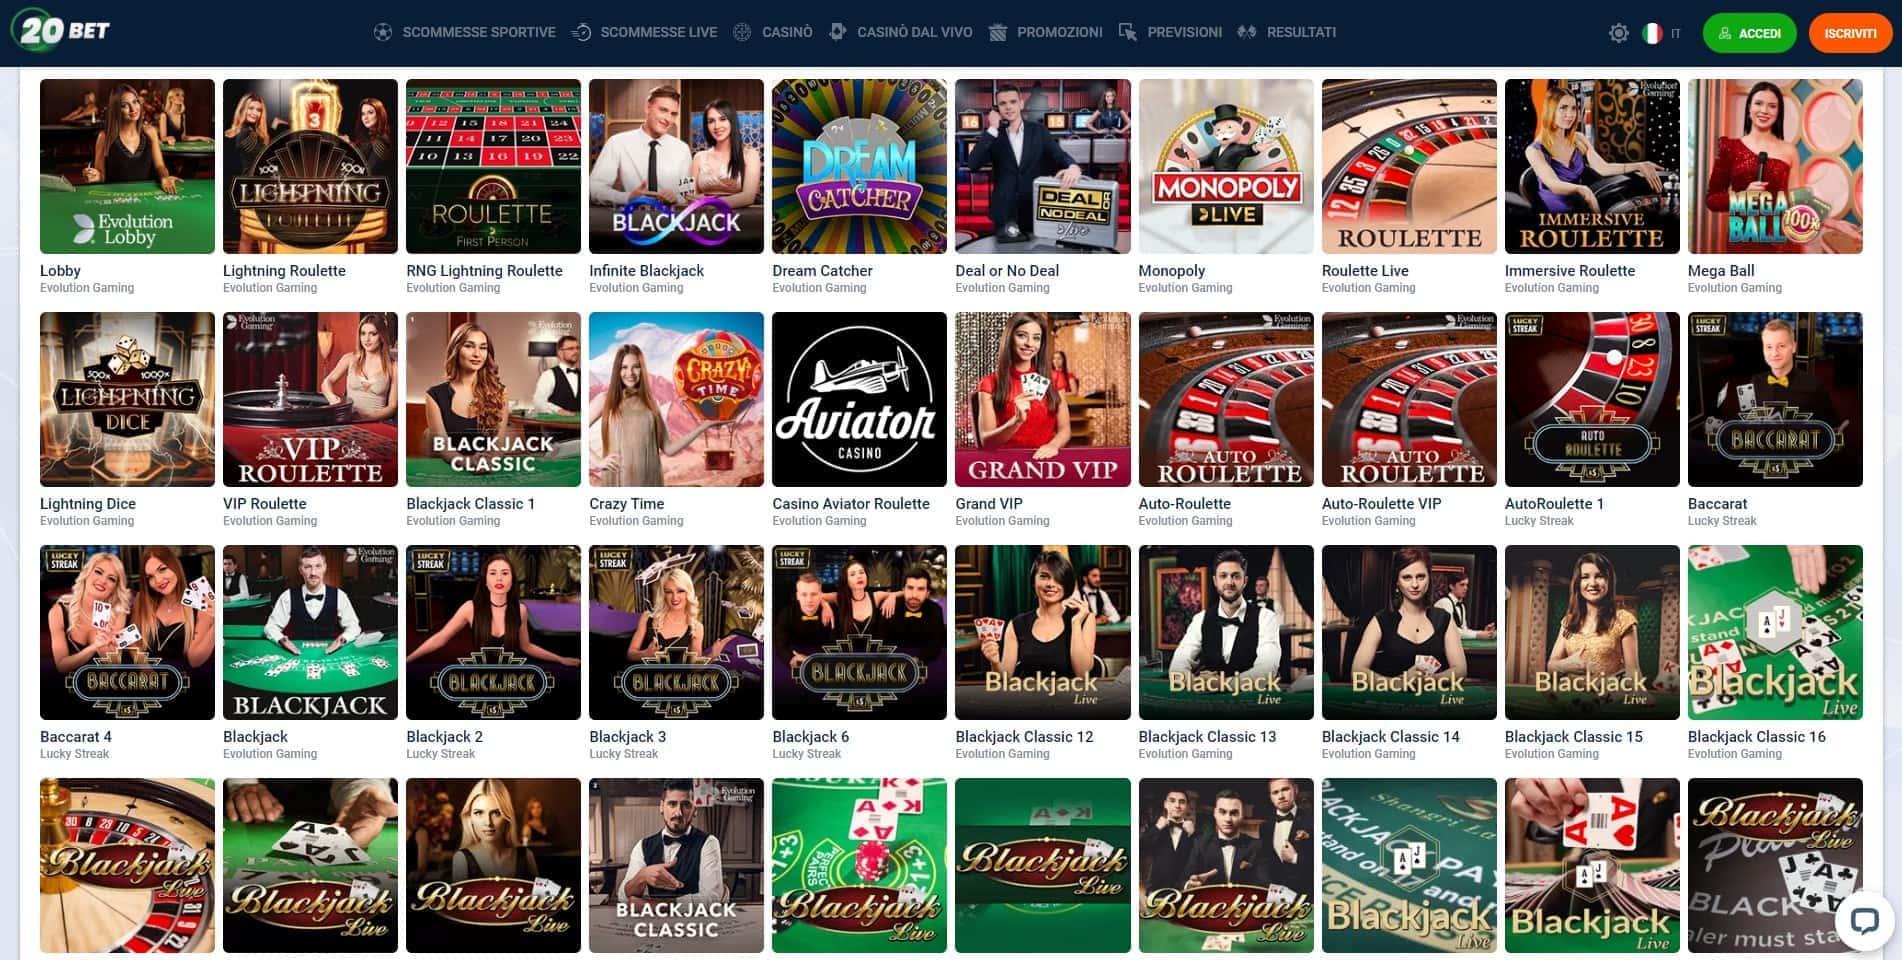 Live Casino 20bet